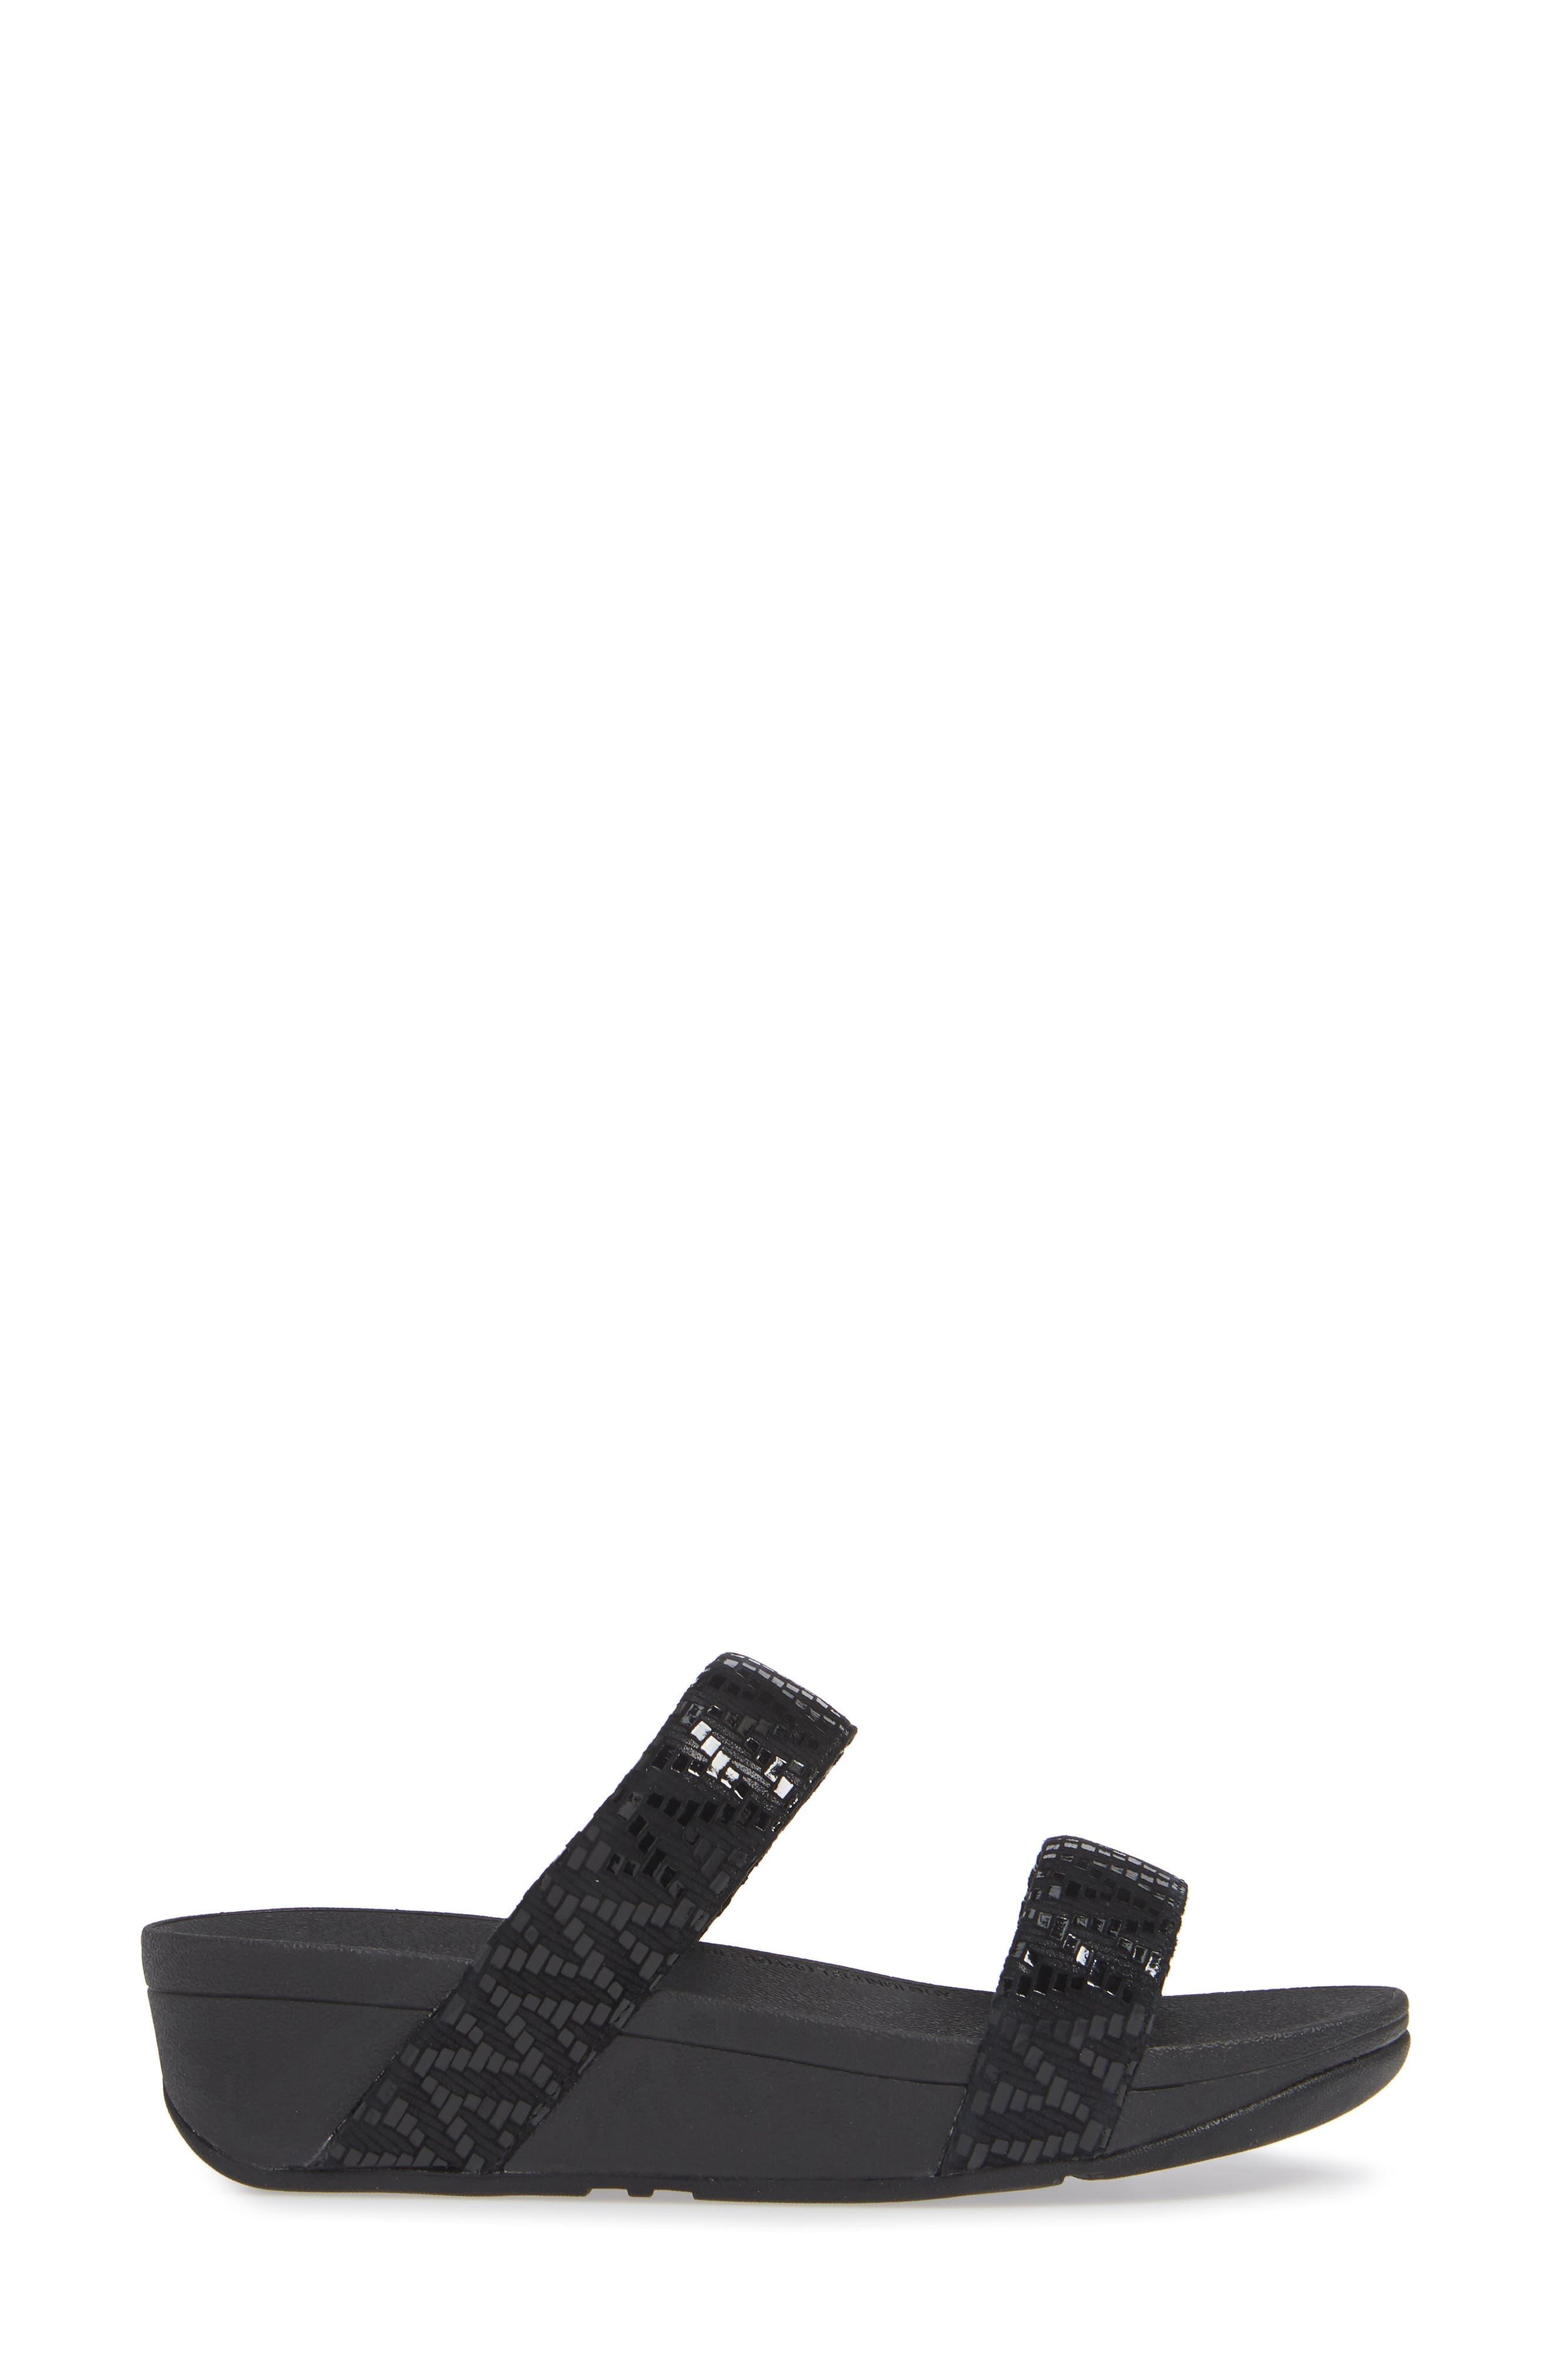 FITFLOP, Lottie Chevron Wedge Slide Sandal, Alternate thumbnail 3, color, BLACK FABRIC